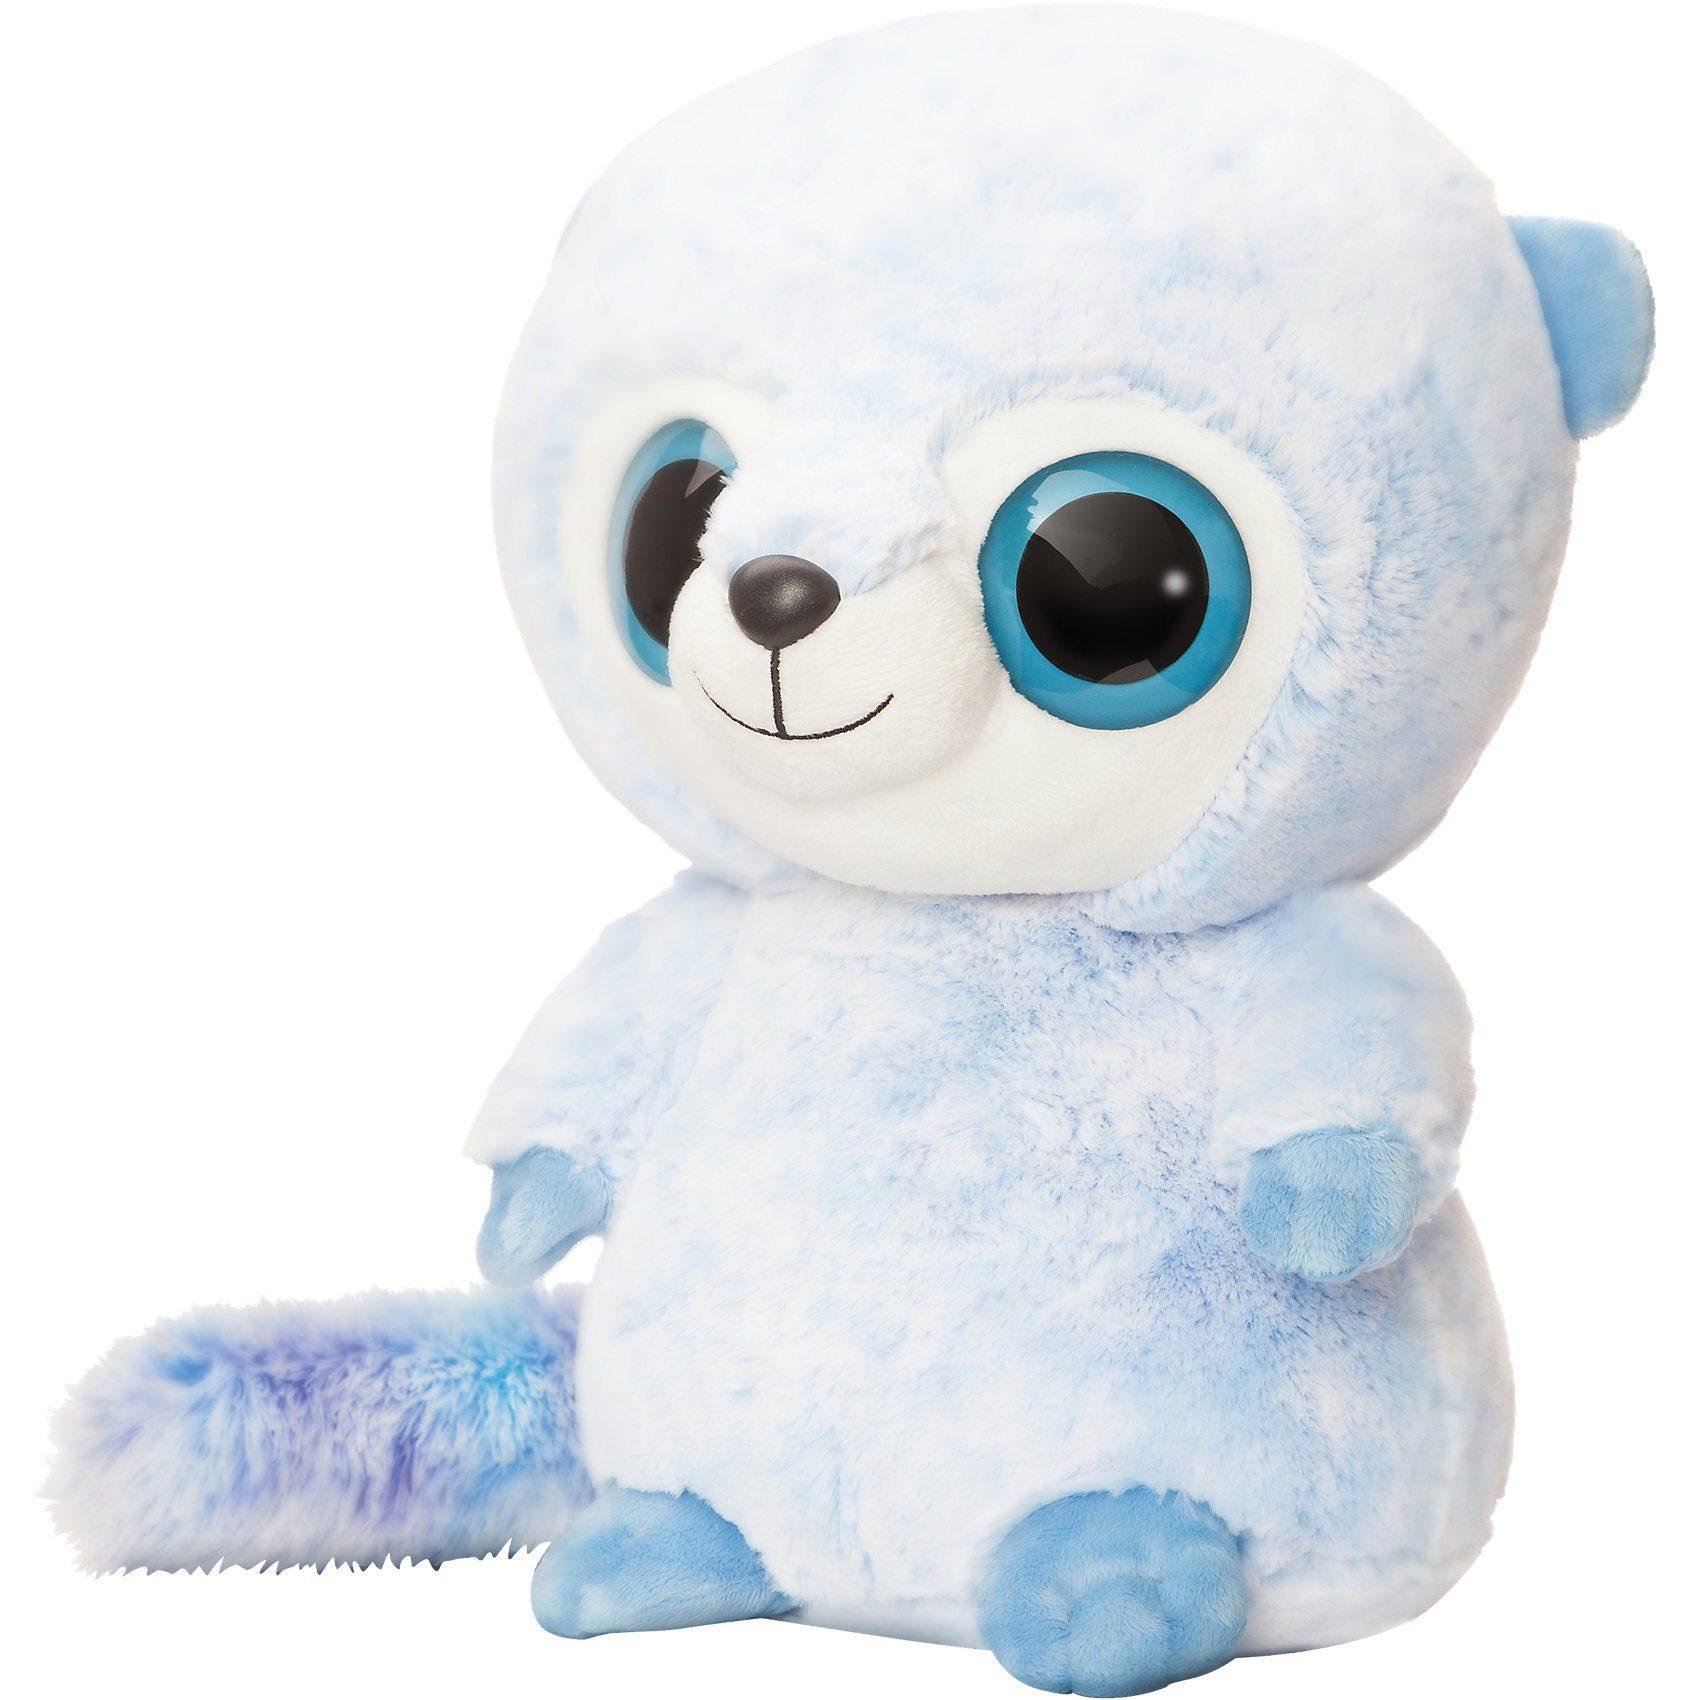 YooHoo Baby blau 28cm